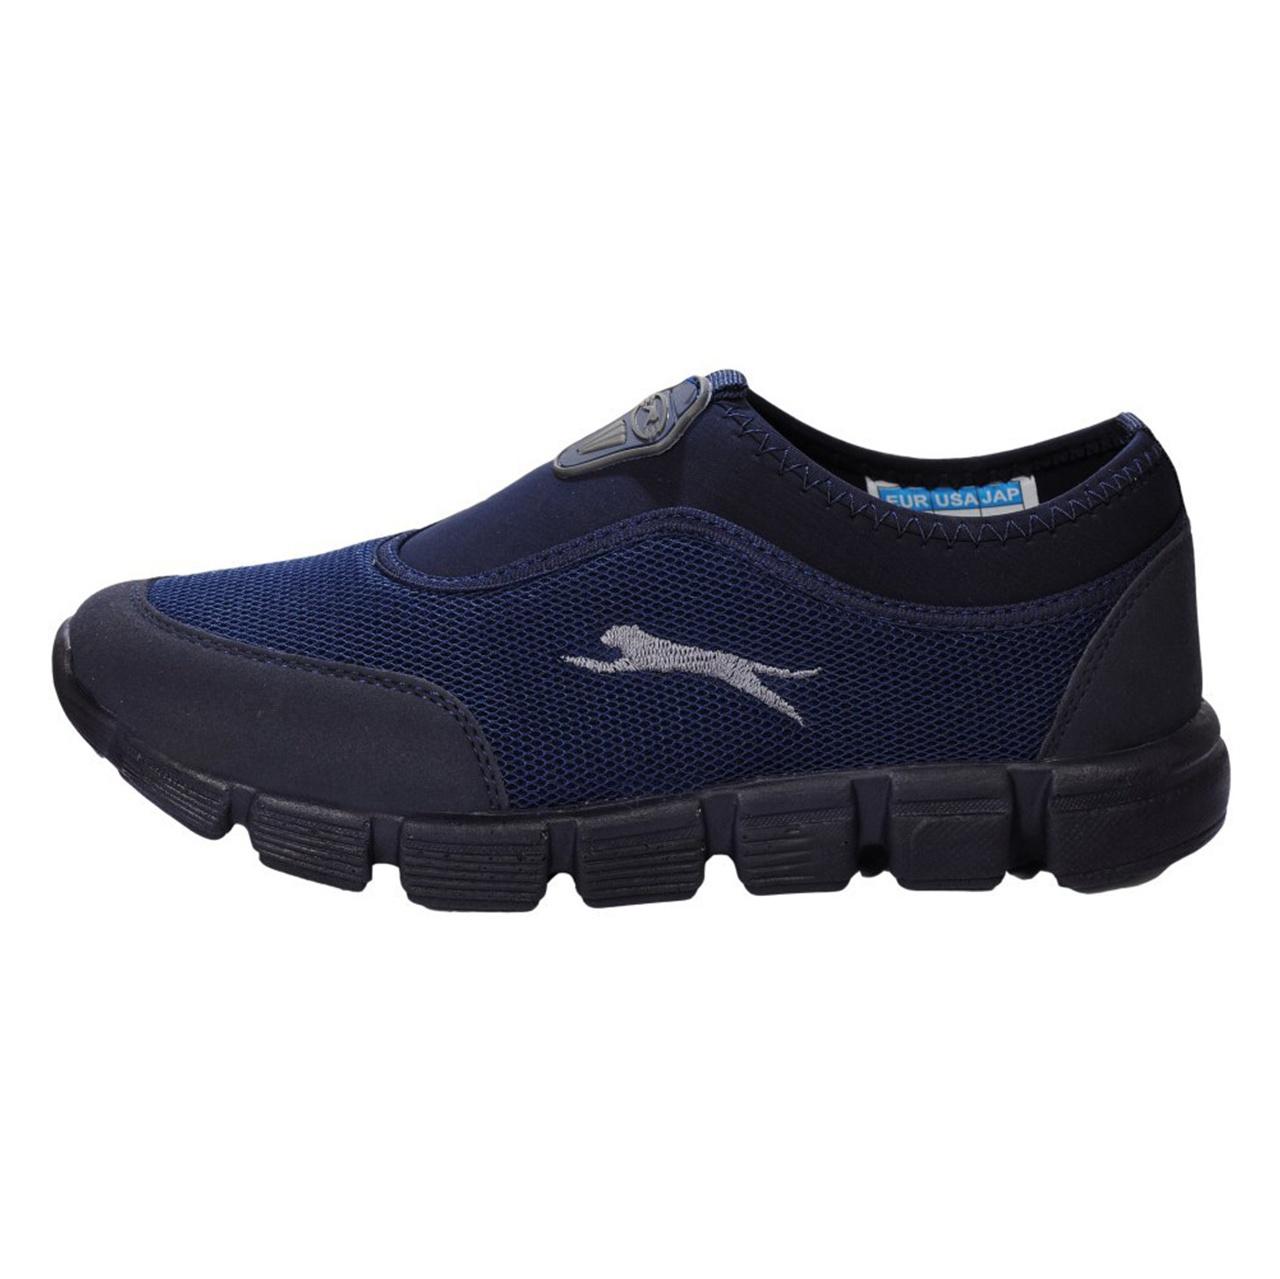 کفش راحتی زنانه مدل NG Z 1200 S